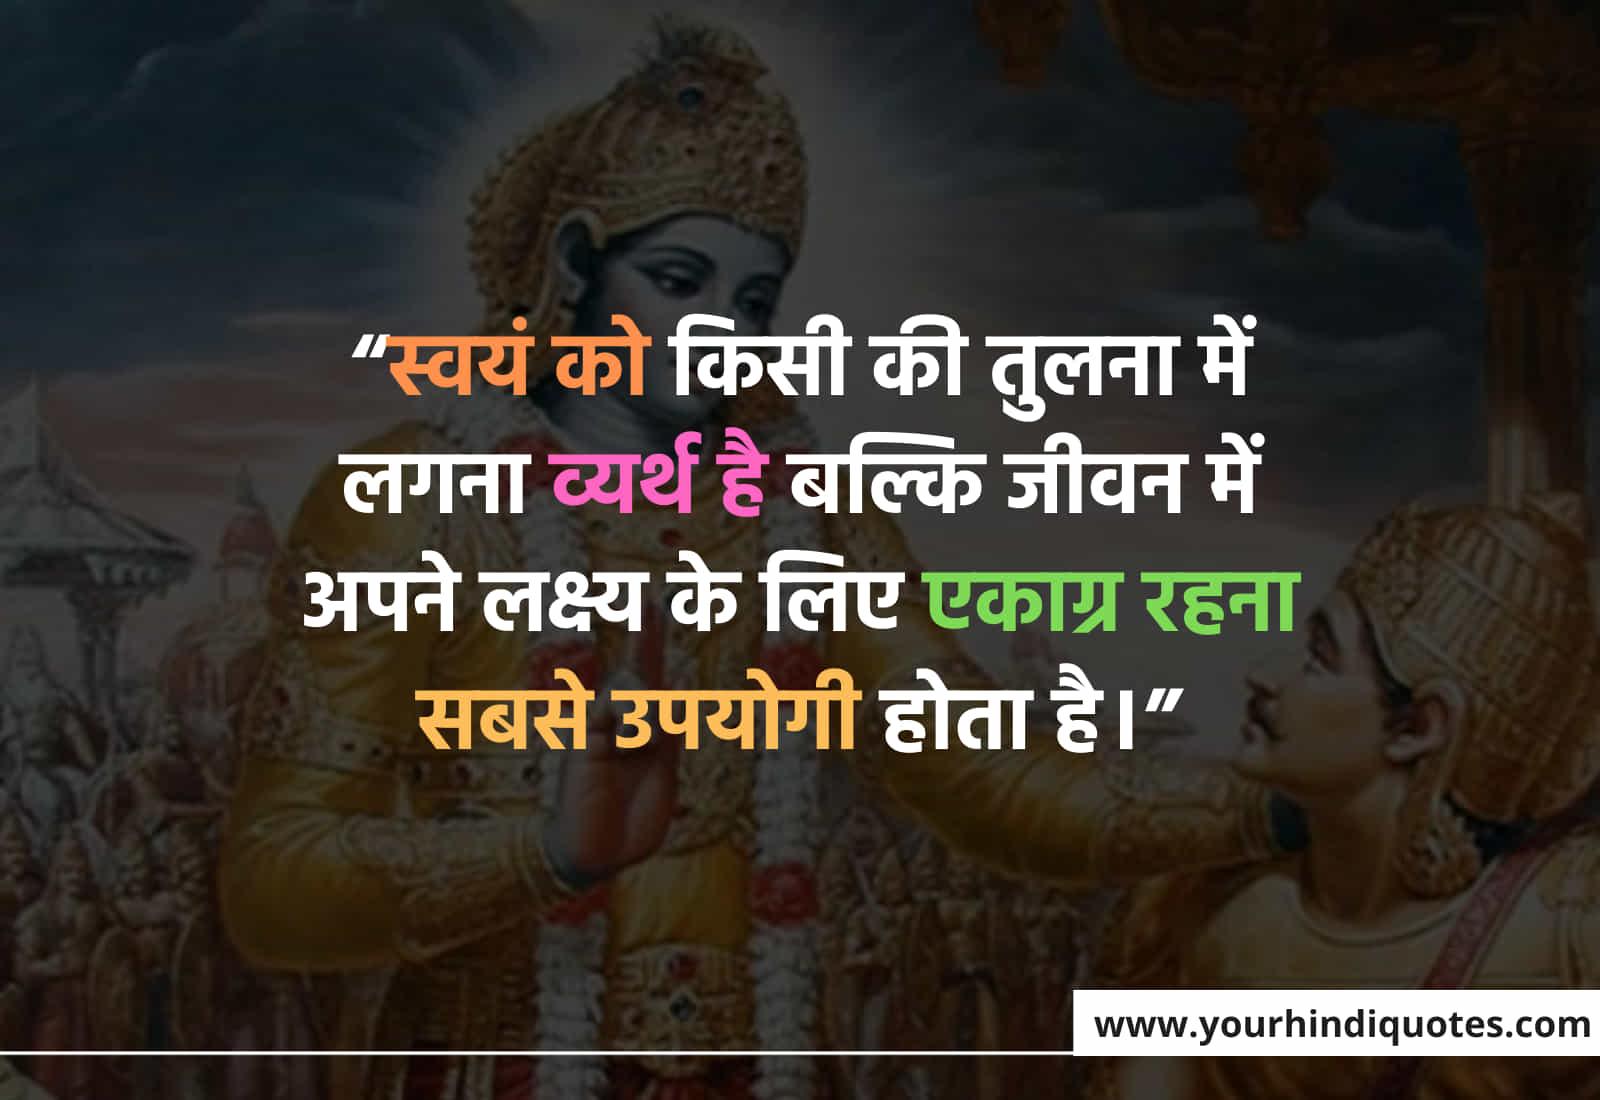 Best Shrimad Bhagwat Gita Quotes for Goal